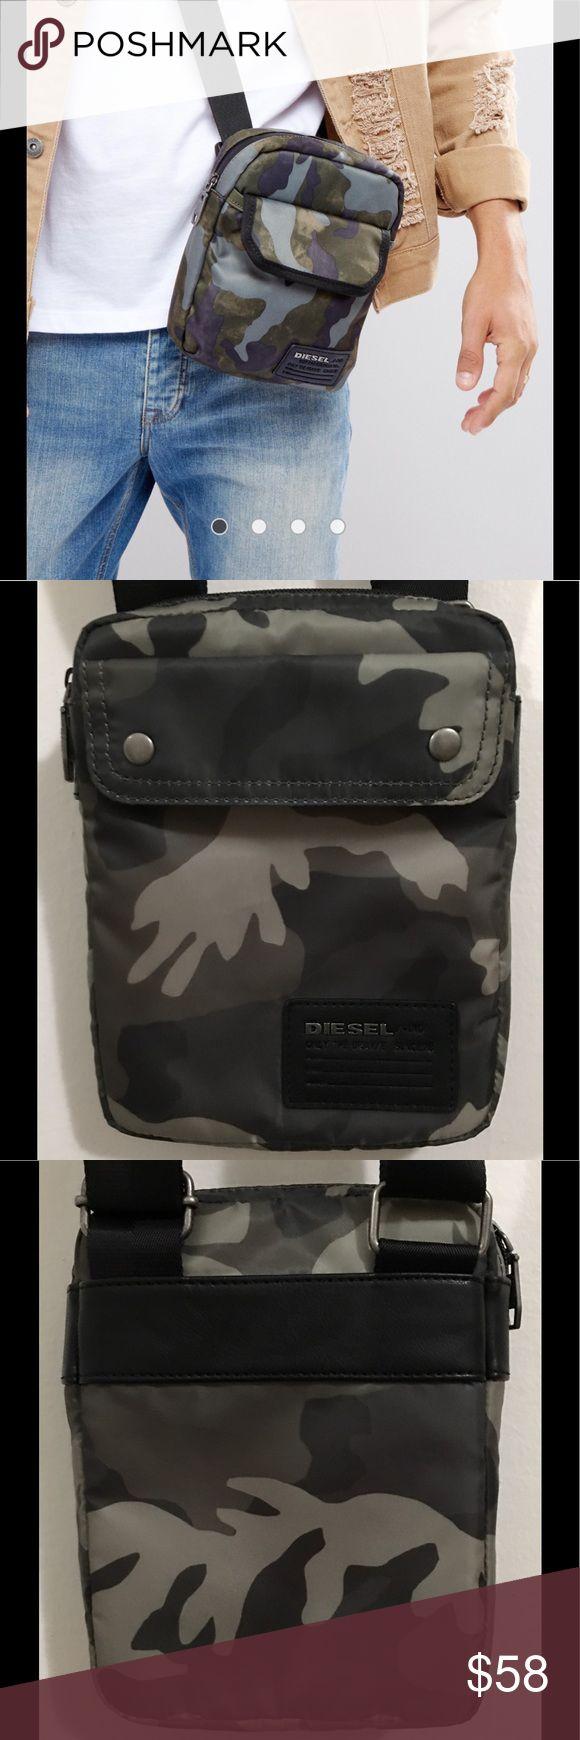 Diesel Cross Body Bag Very Cool Diesel Flight Bag, Durable Fabric Outer, Adjustable Shoulder Strap, Zip Top Closure, Black/Grey Camo, 99%Polyster, Almost New, 2Times used Diesel Bags Messenger Bags